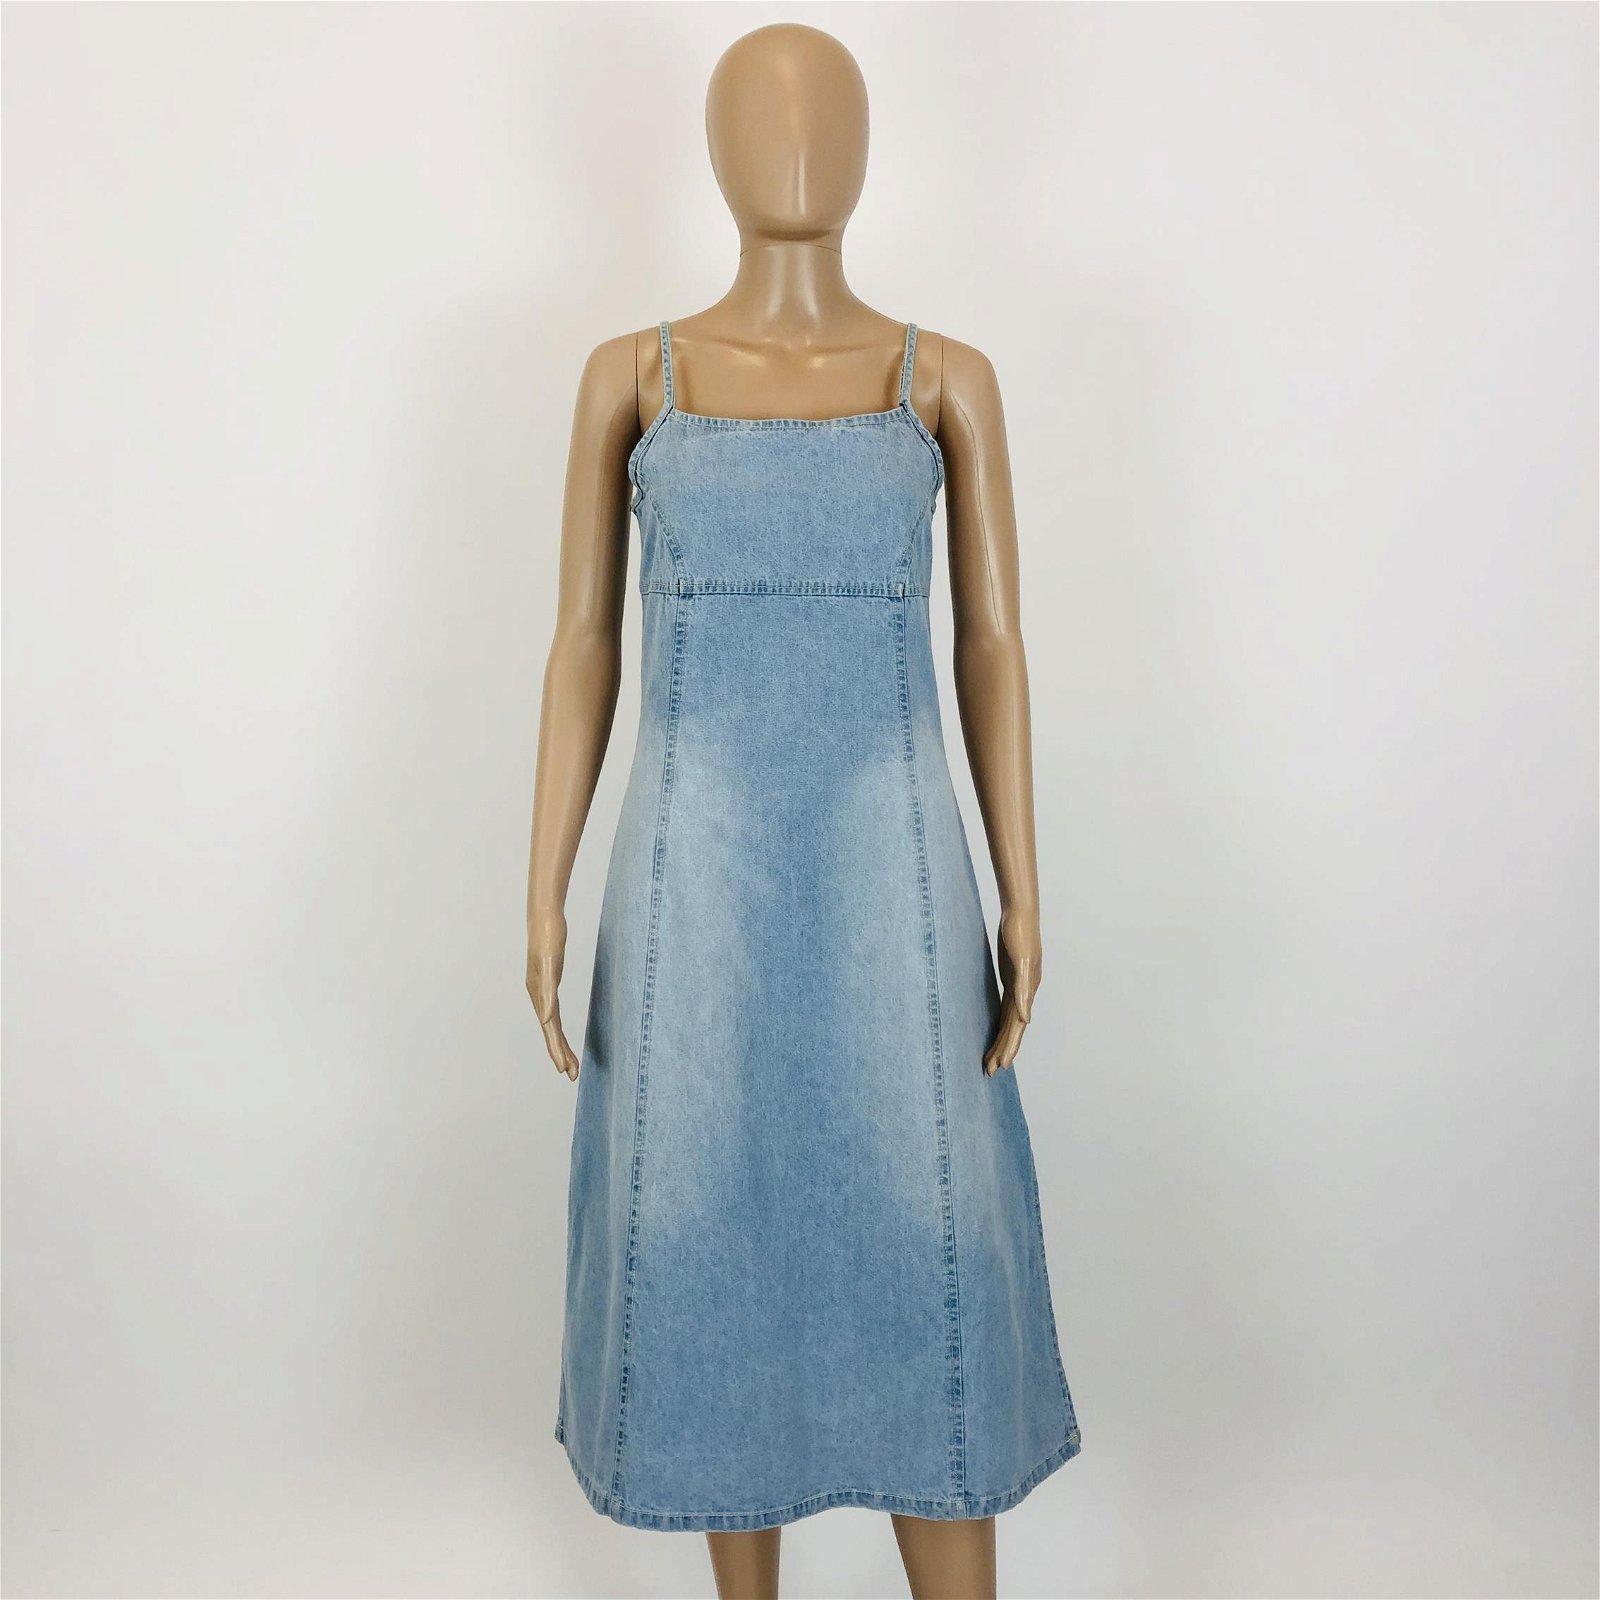 Vintage Women's T-K-F Denim Dress EUR 40 US 10